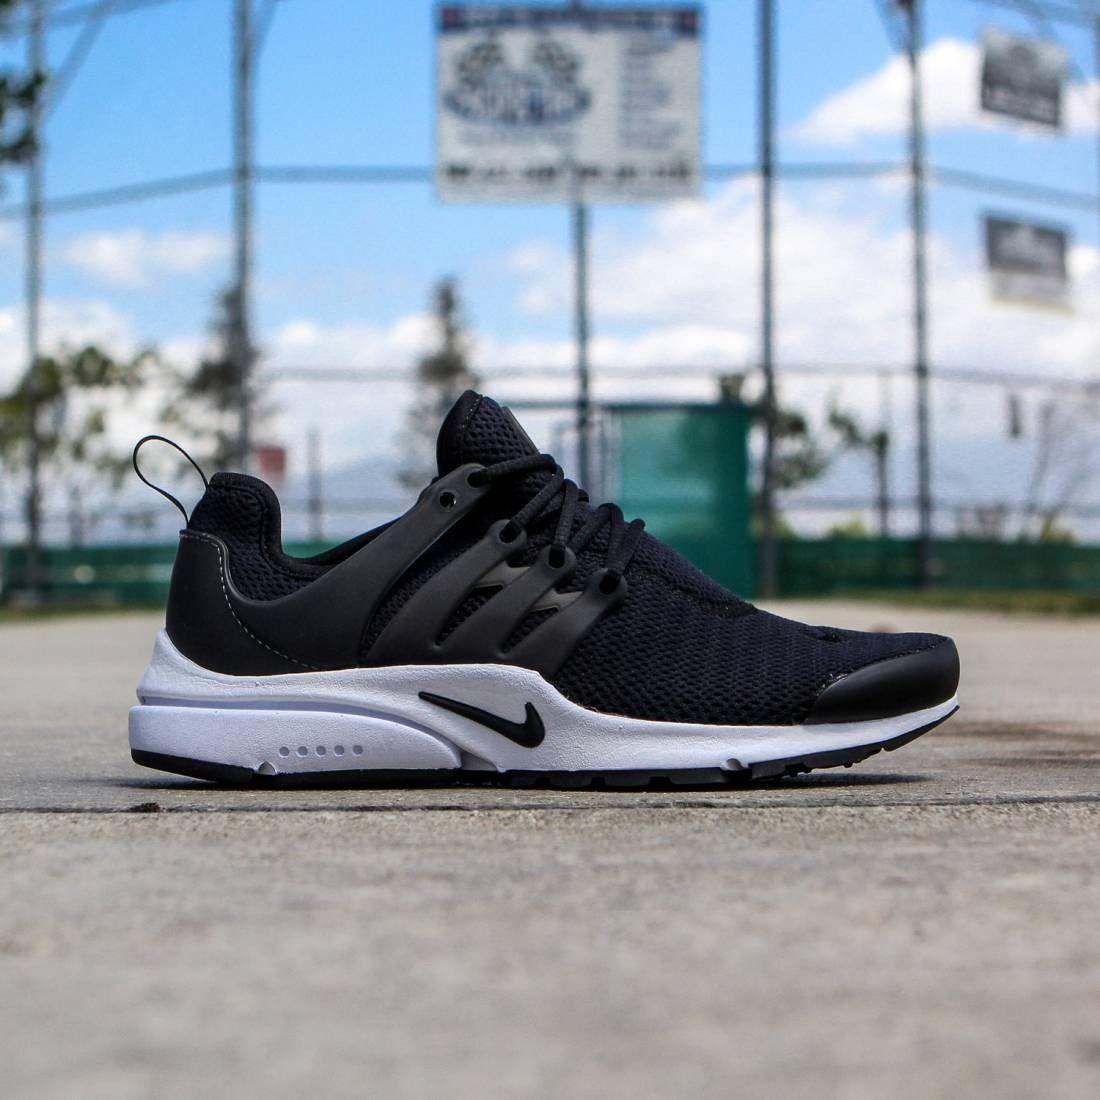 Nike Women Nike Air Presto Black White Black In 2021 Nike Running Shoes Women Black Nike Shoes Sneakers Men Fashion